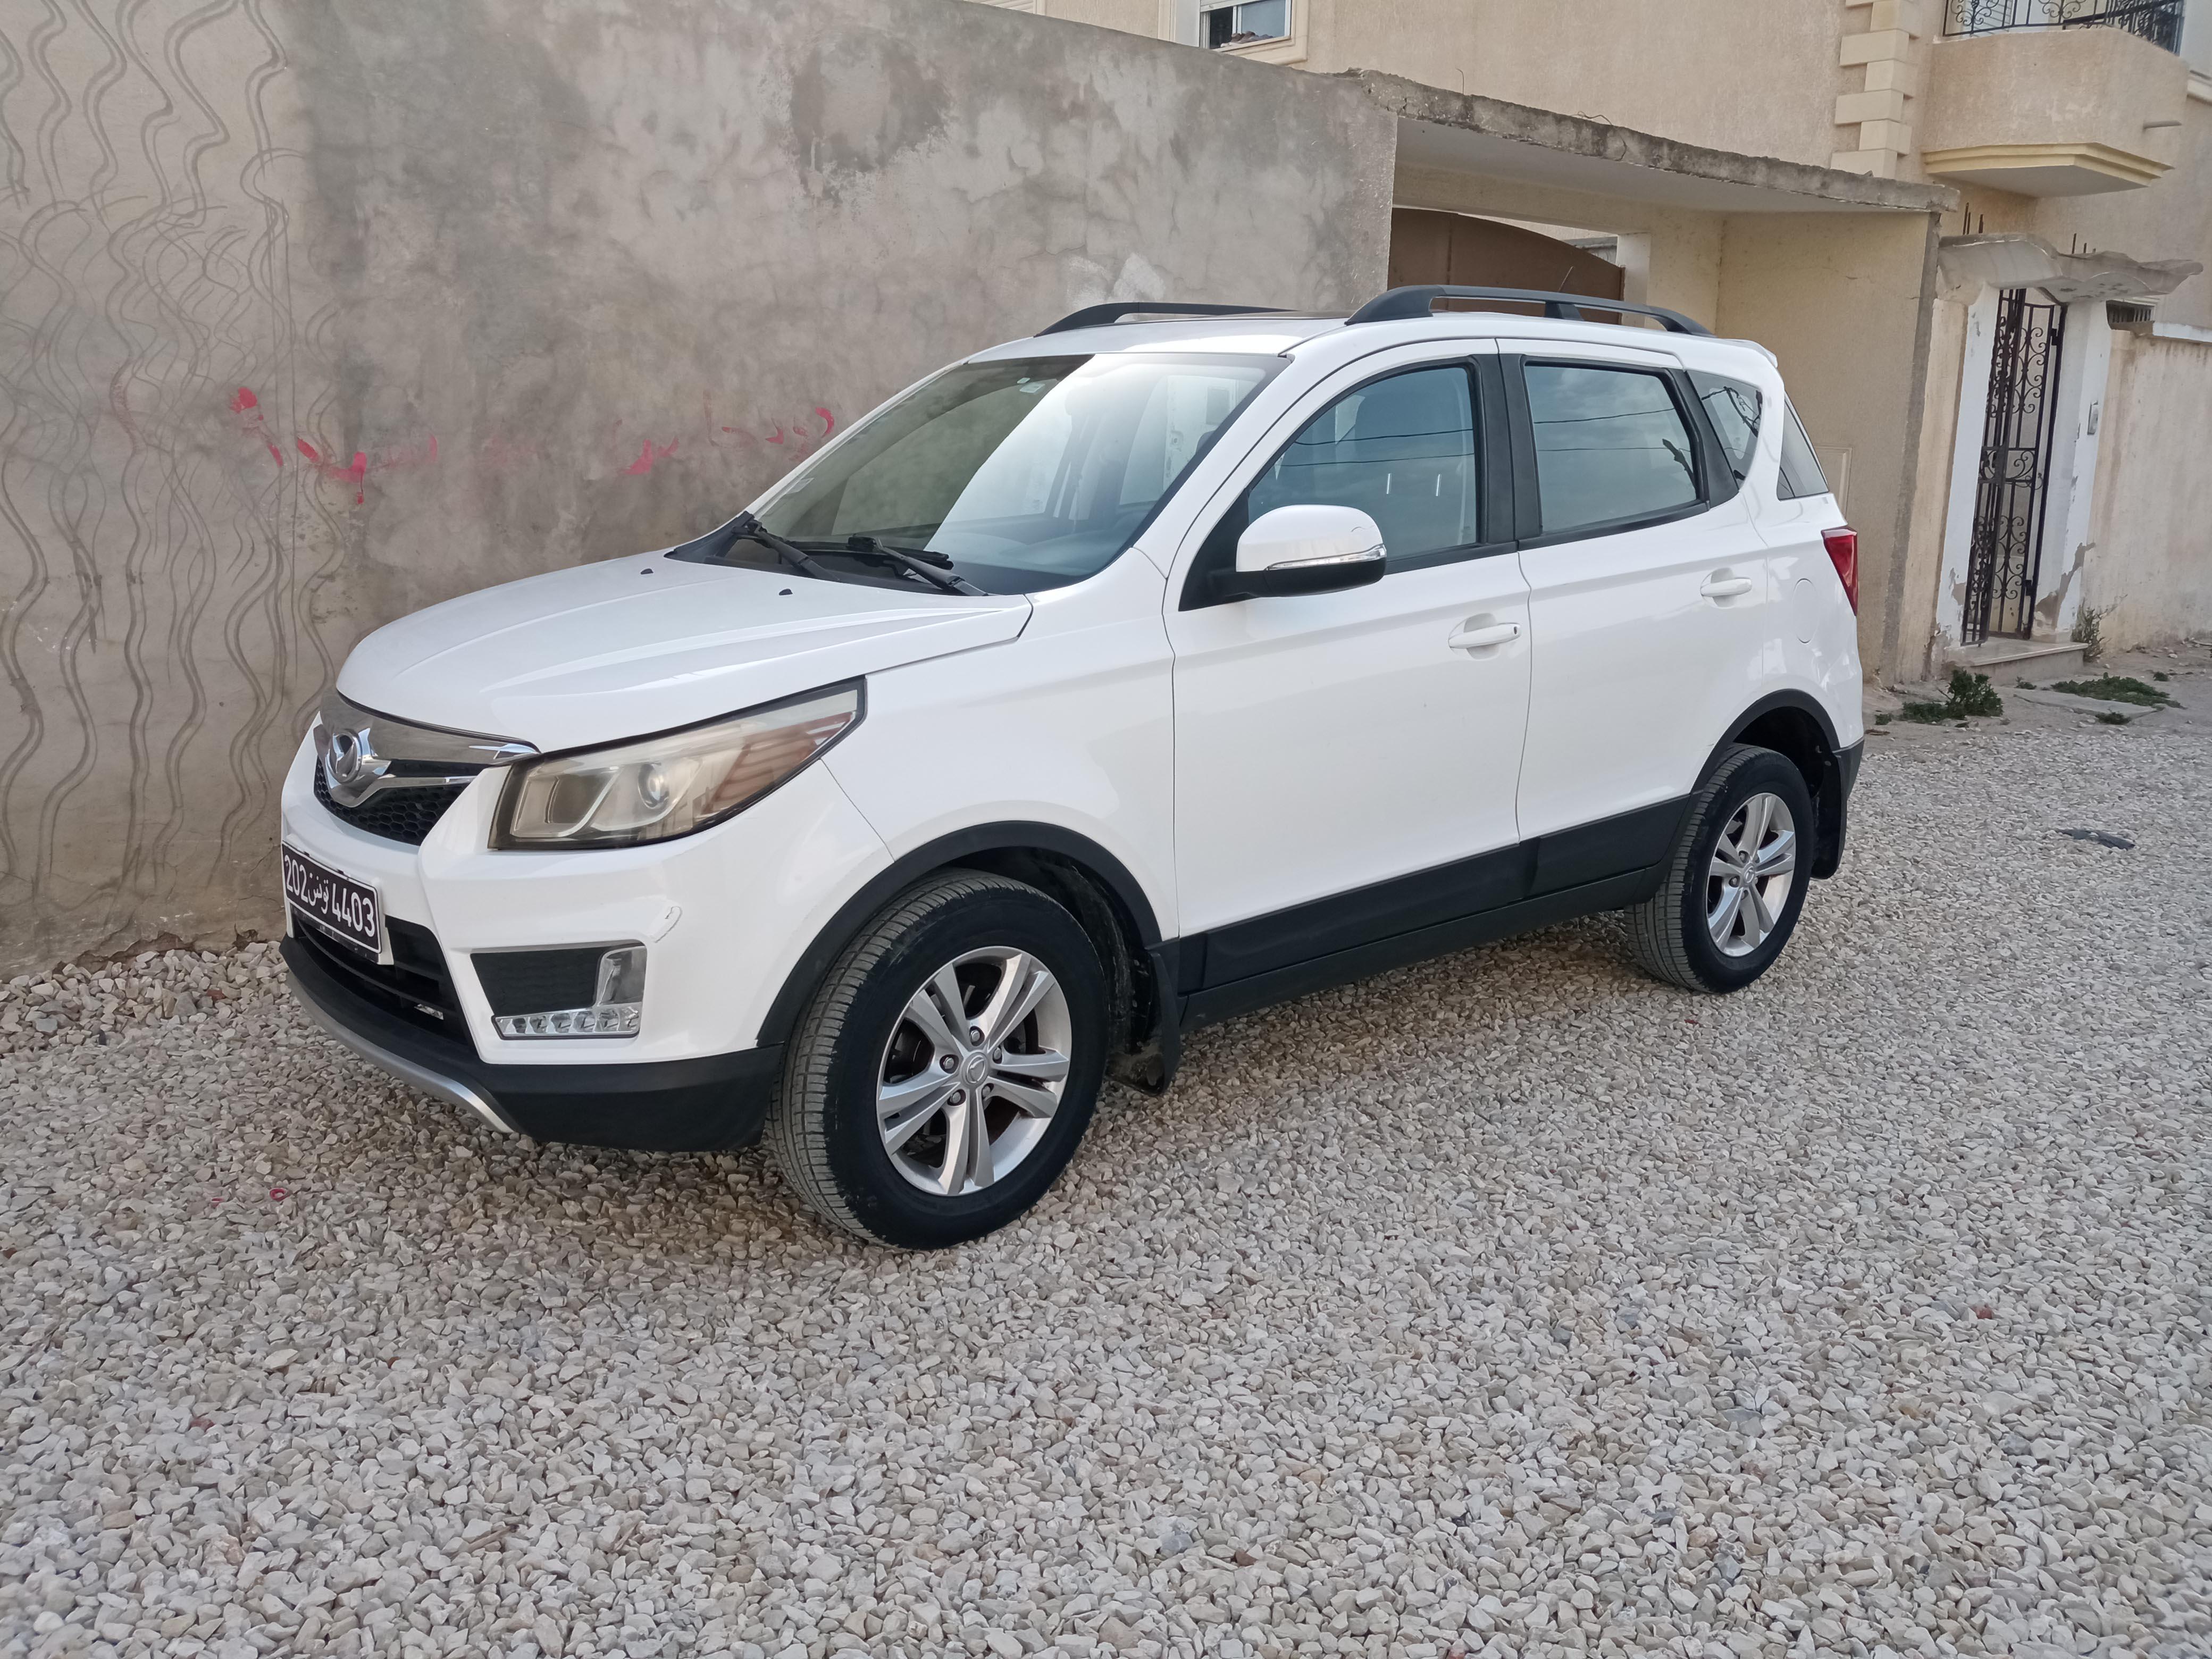 vente voiture occasion tunisie baic yx kenbo s2